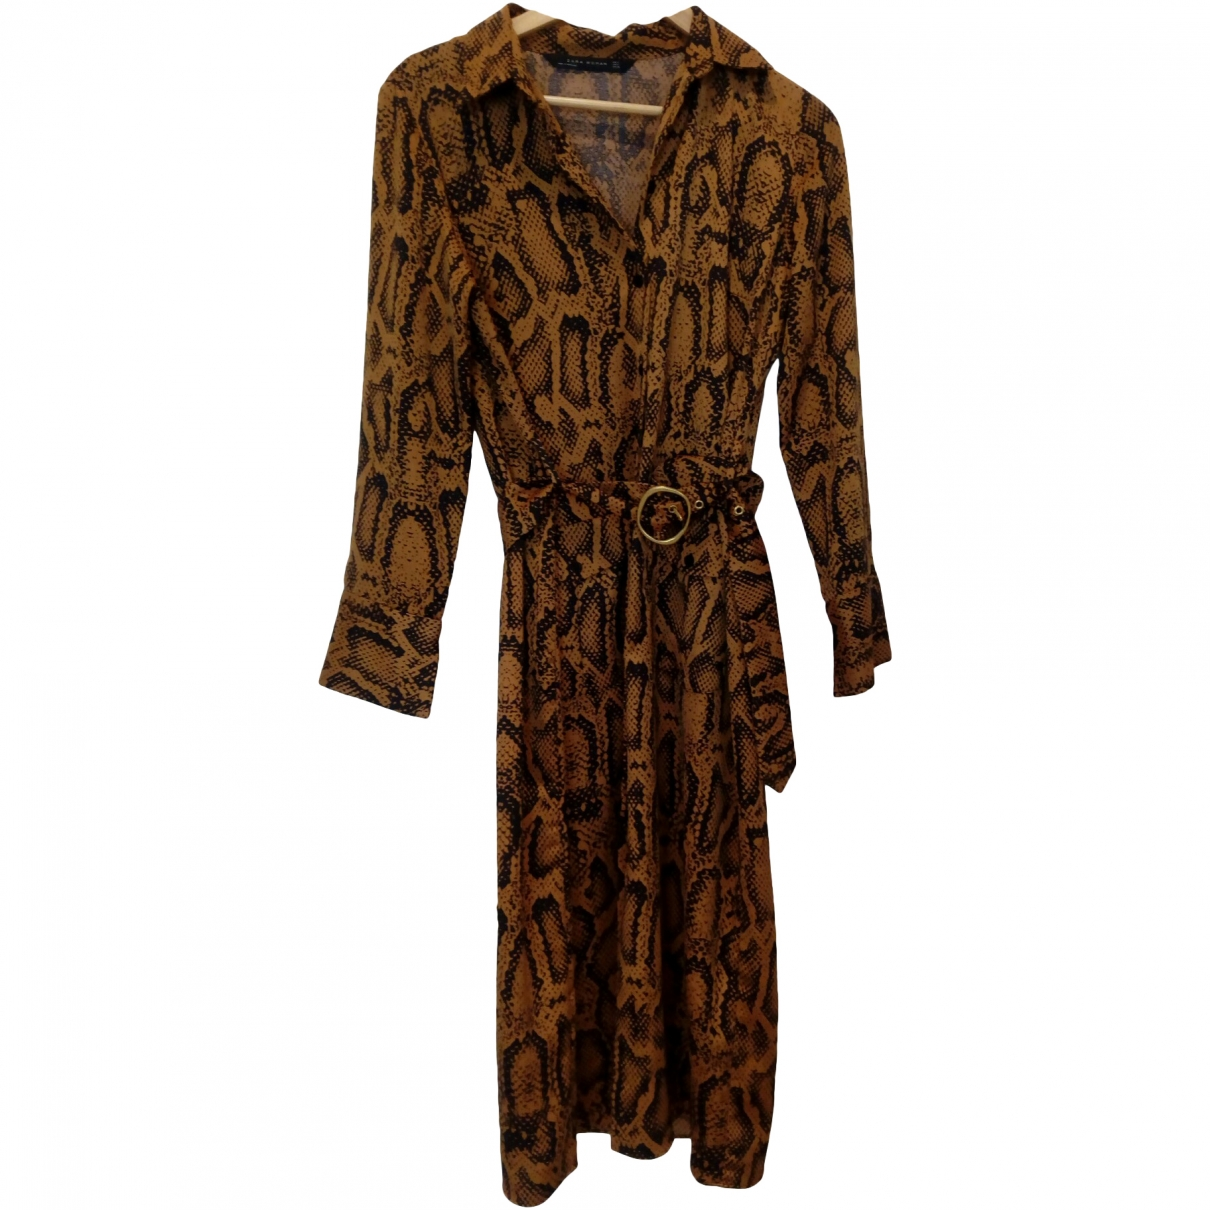 Zara \N Brown dress for Women M International